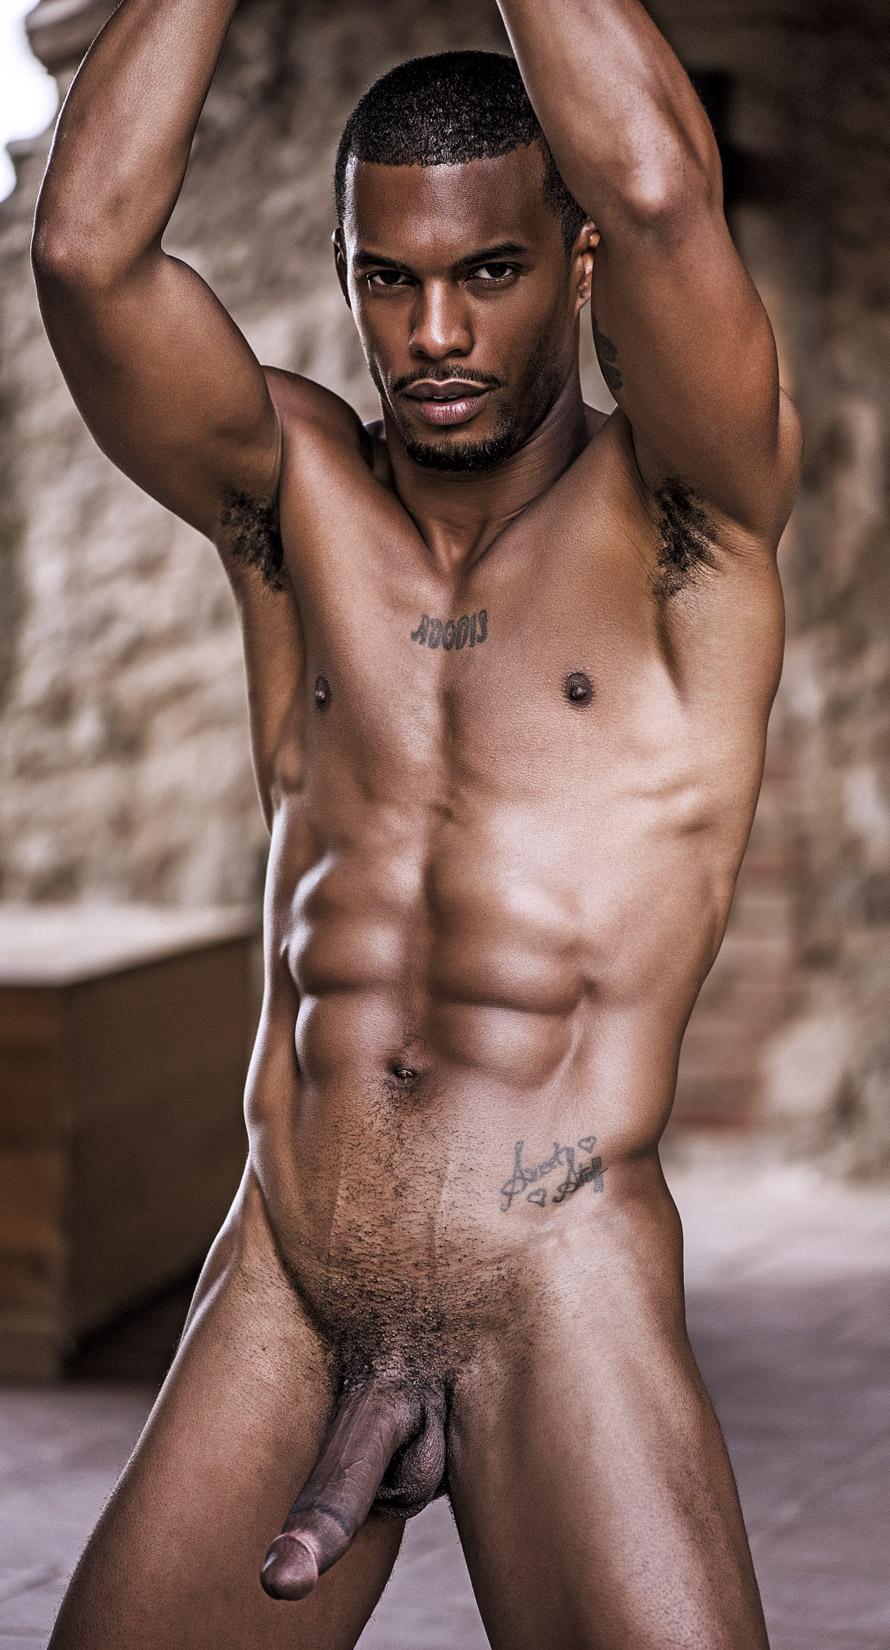 holloween-black-nude-studs-fake